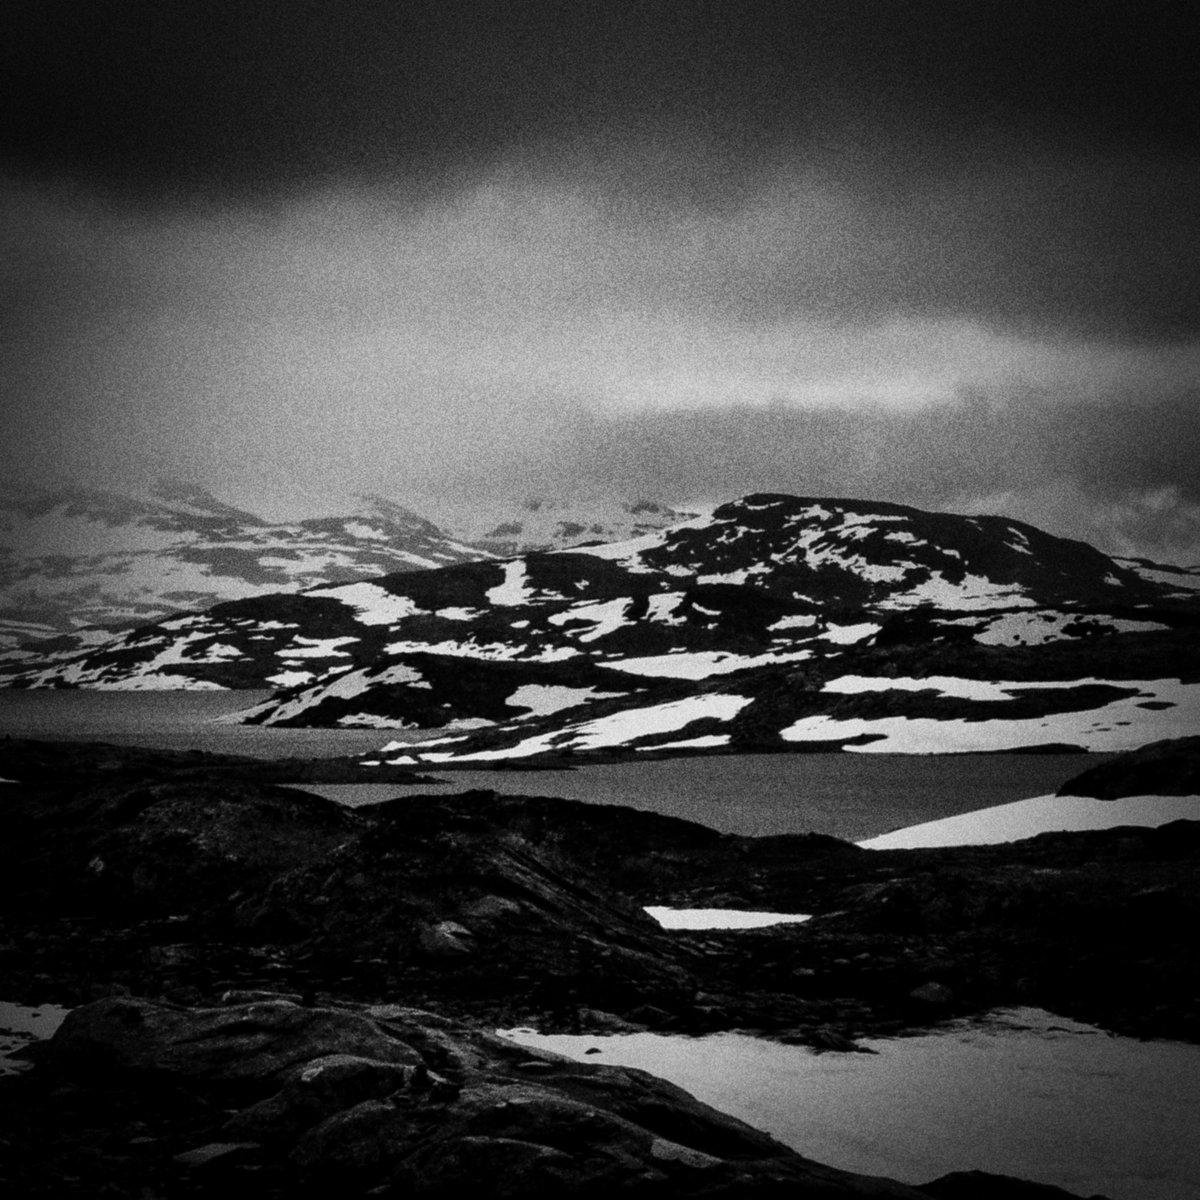 Jotunheimen • • • • #trollbreeder #grim #norse #mythology #blackmetal #deathmetal #progressivemetal #progmetal #metal #darkness #mountains #norway #vikingmetal #folkmetal #svartmetal #melodicmetal #atmosphericmetal #guitarist #troll #norge #instrumentalmetal #atmosphericpic.twitter.com/qm1pIUkc1A